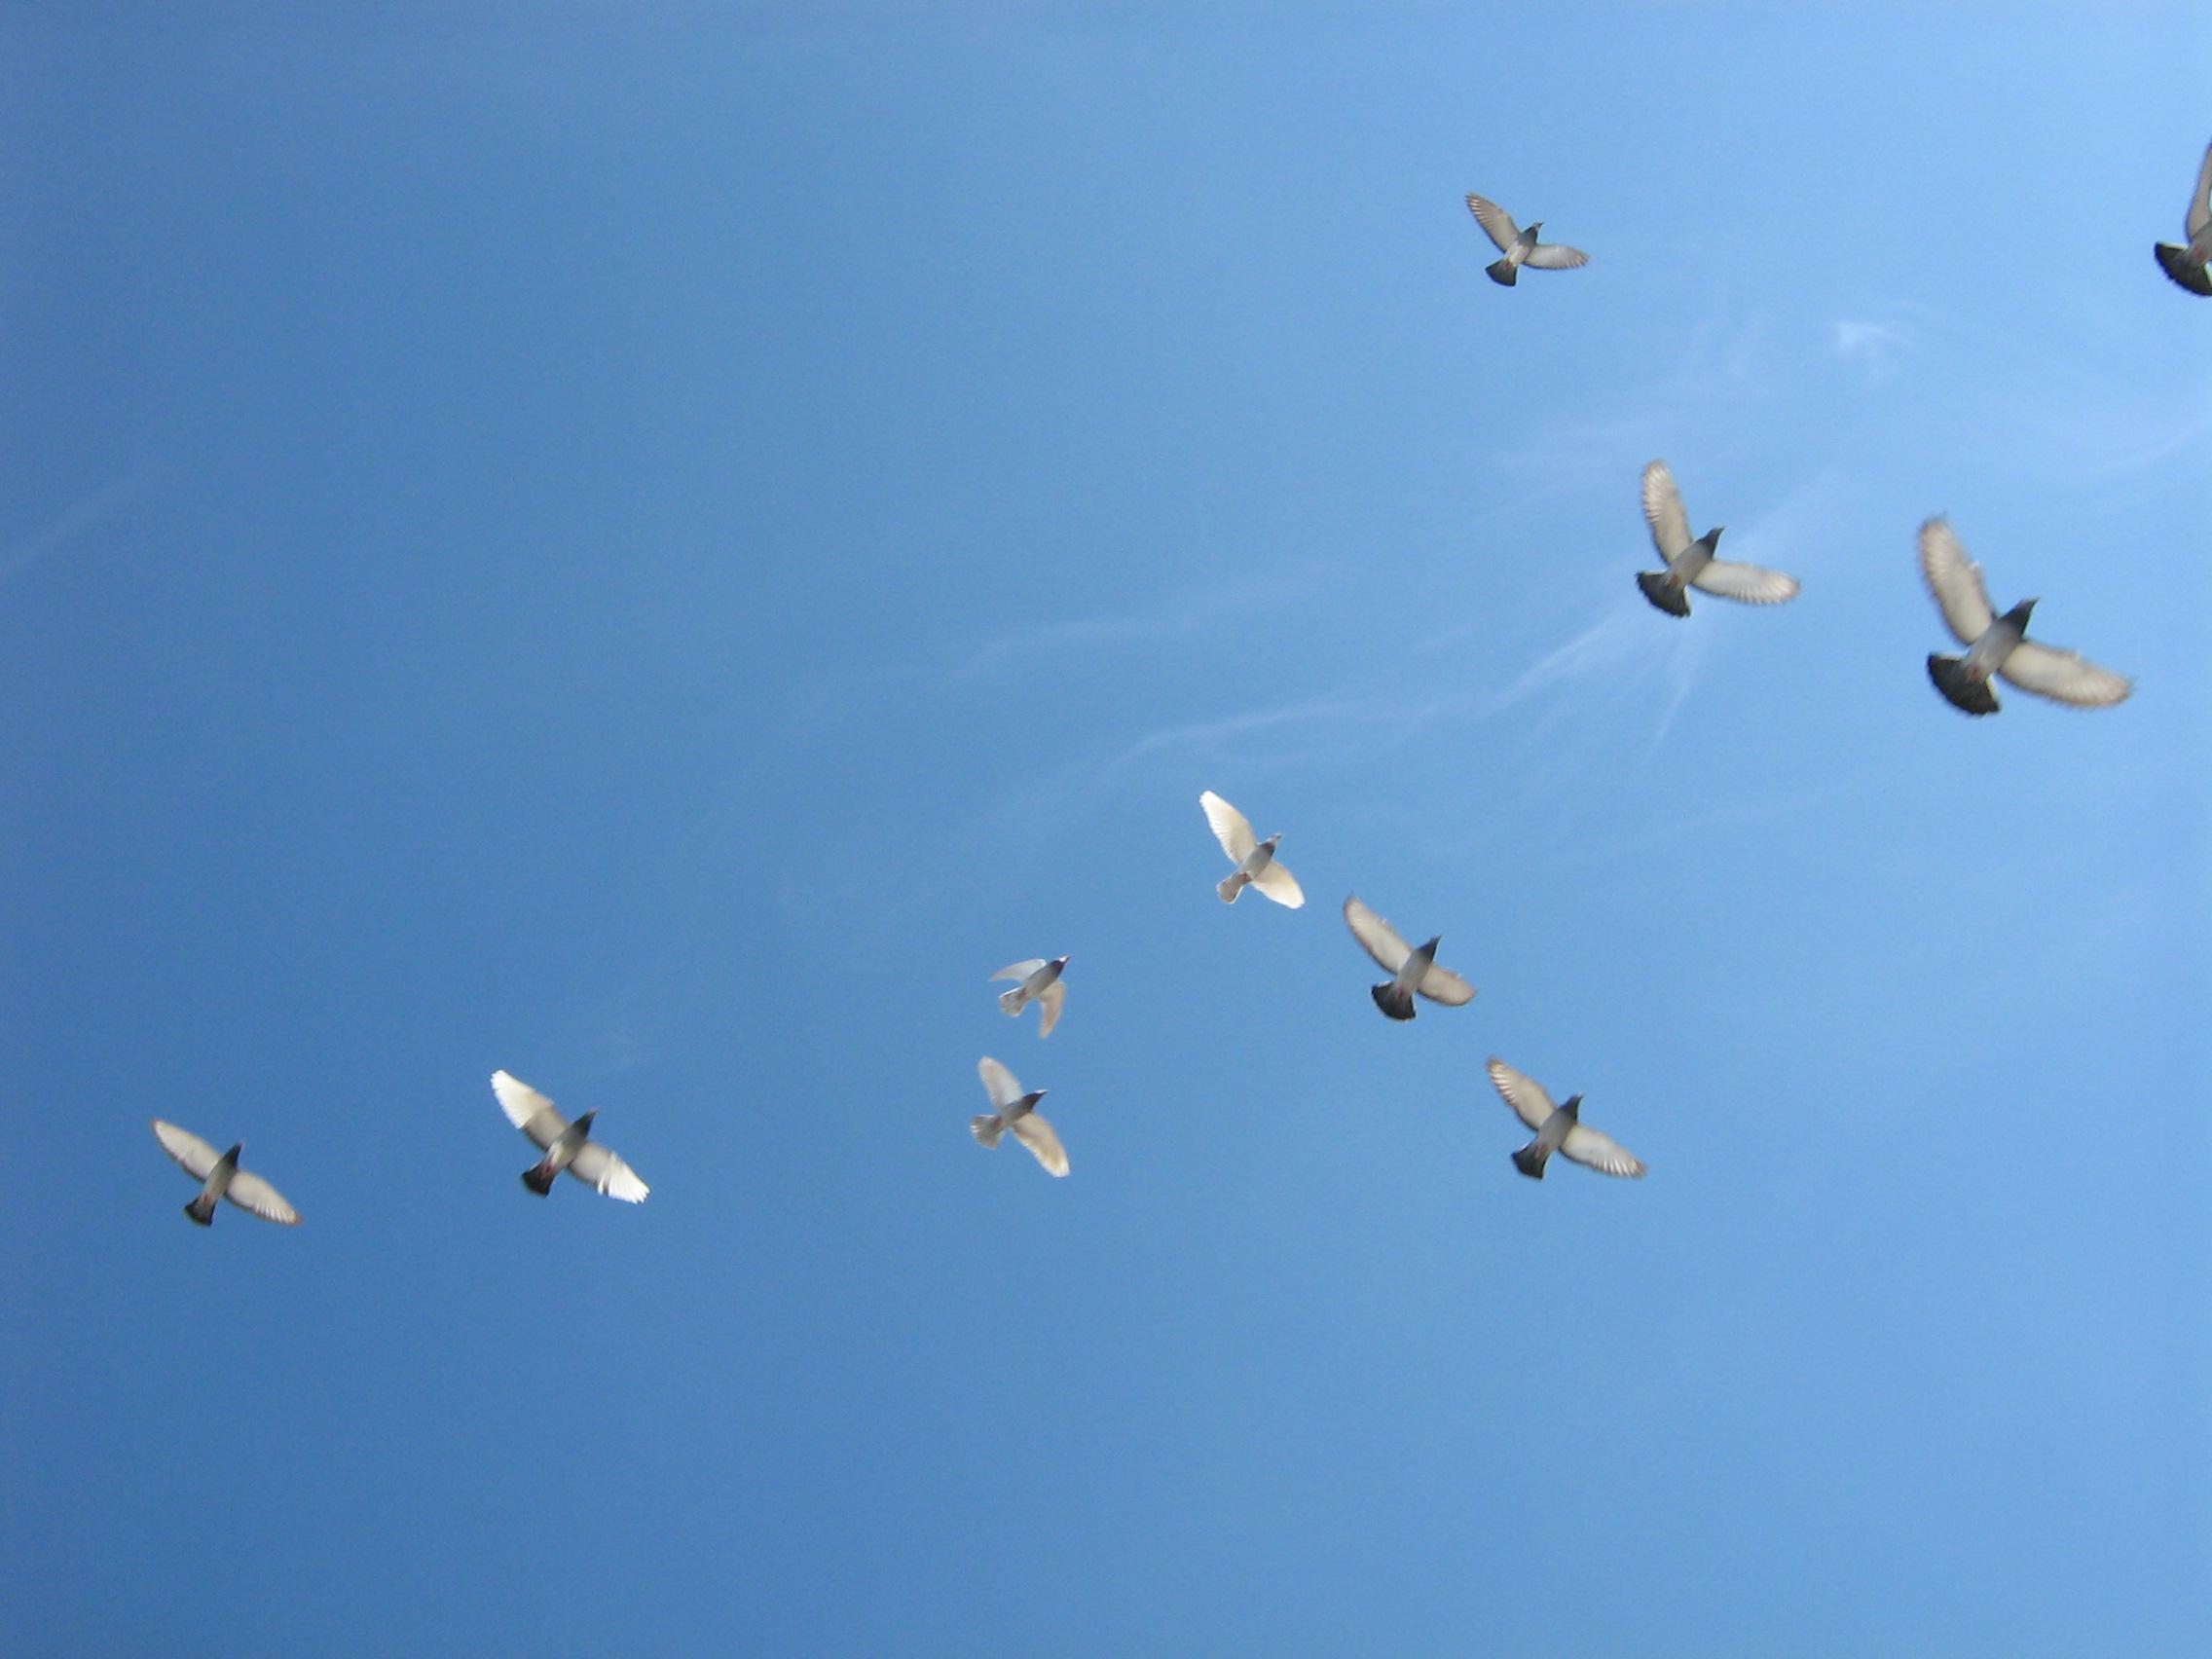 File:Flying-birds.jpg - Wikimedia Commons